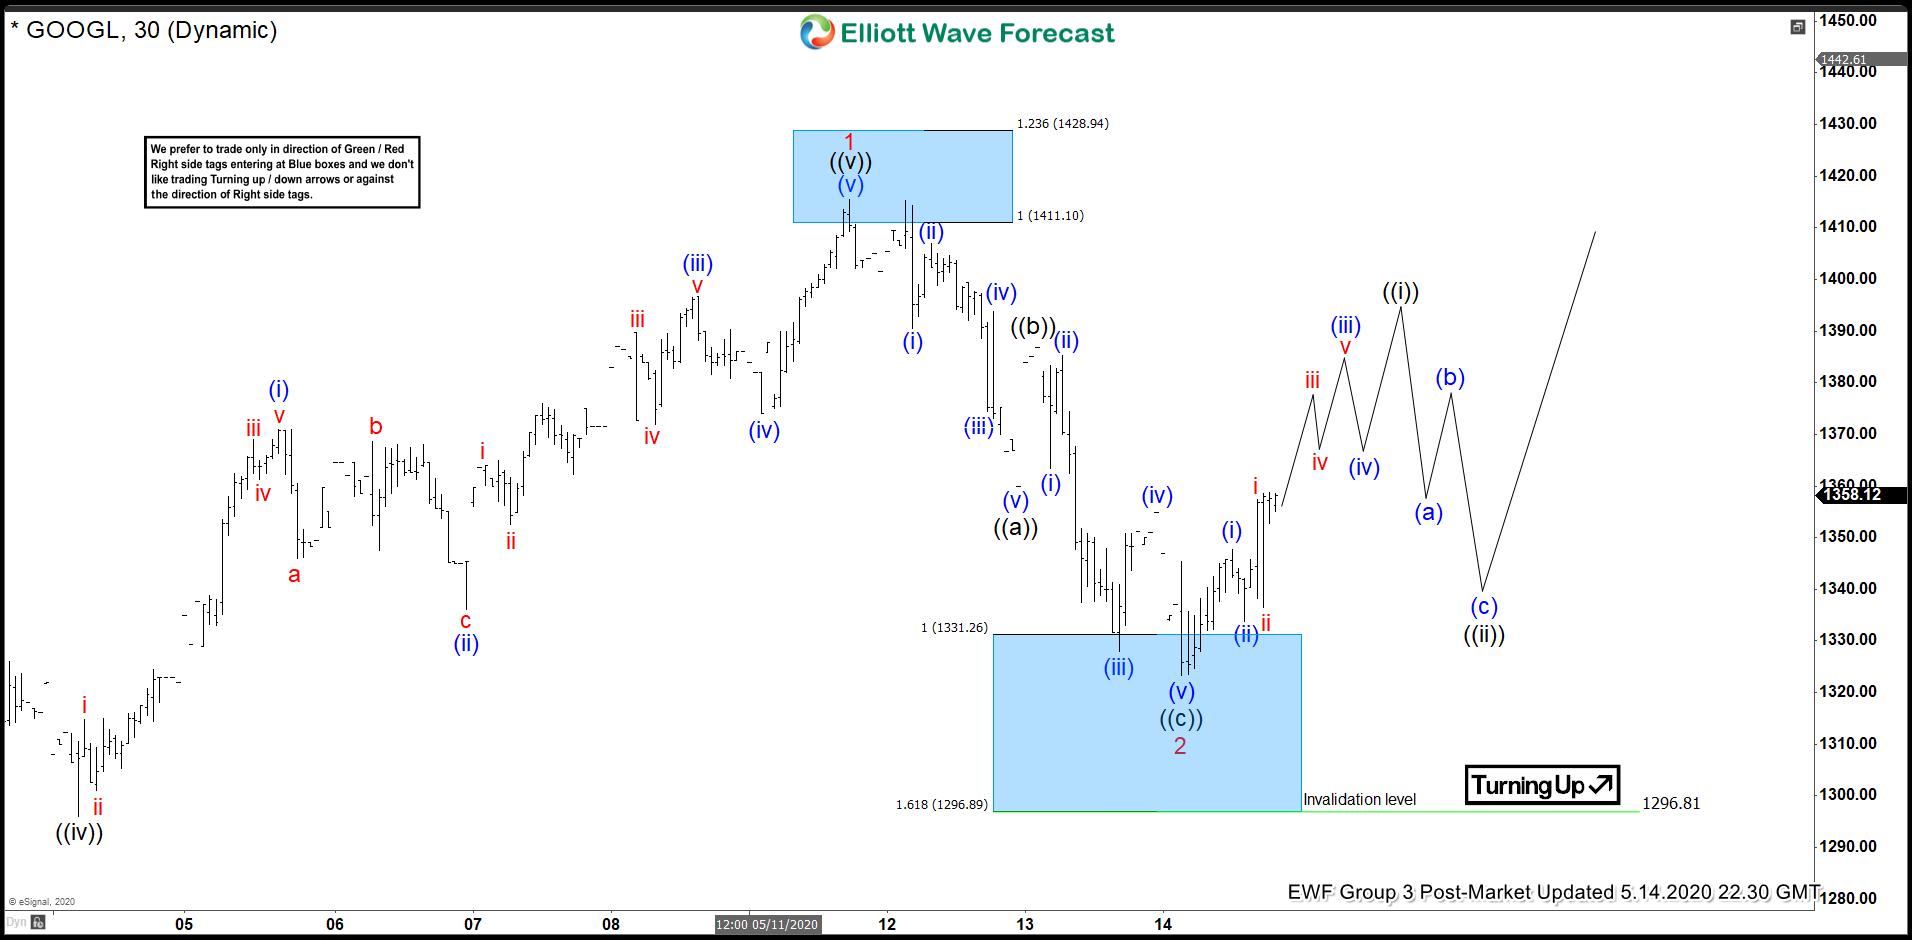 GOOGLE (GOOGL) Elliott Wave Forecasting The Path